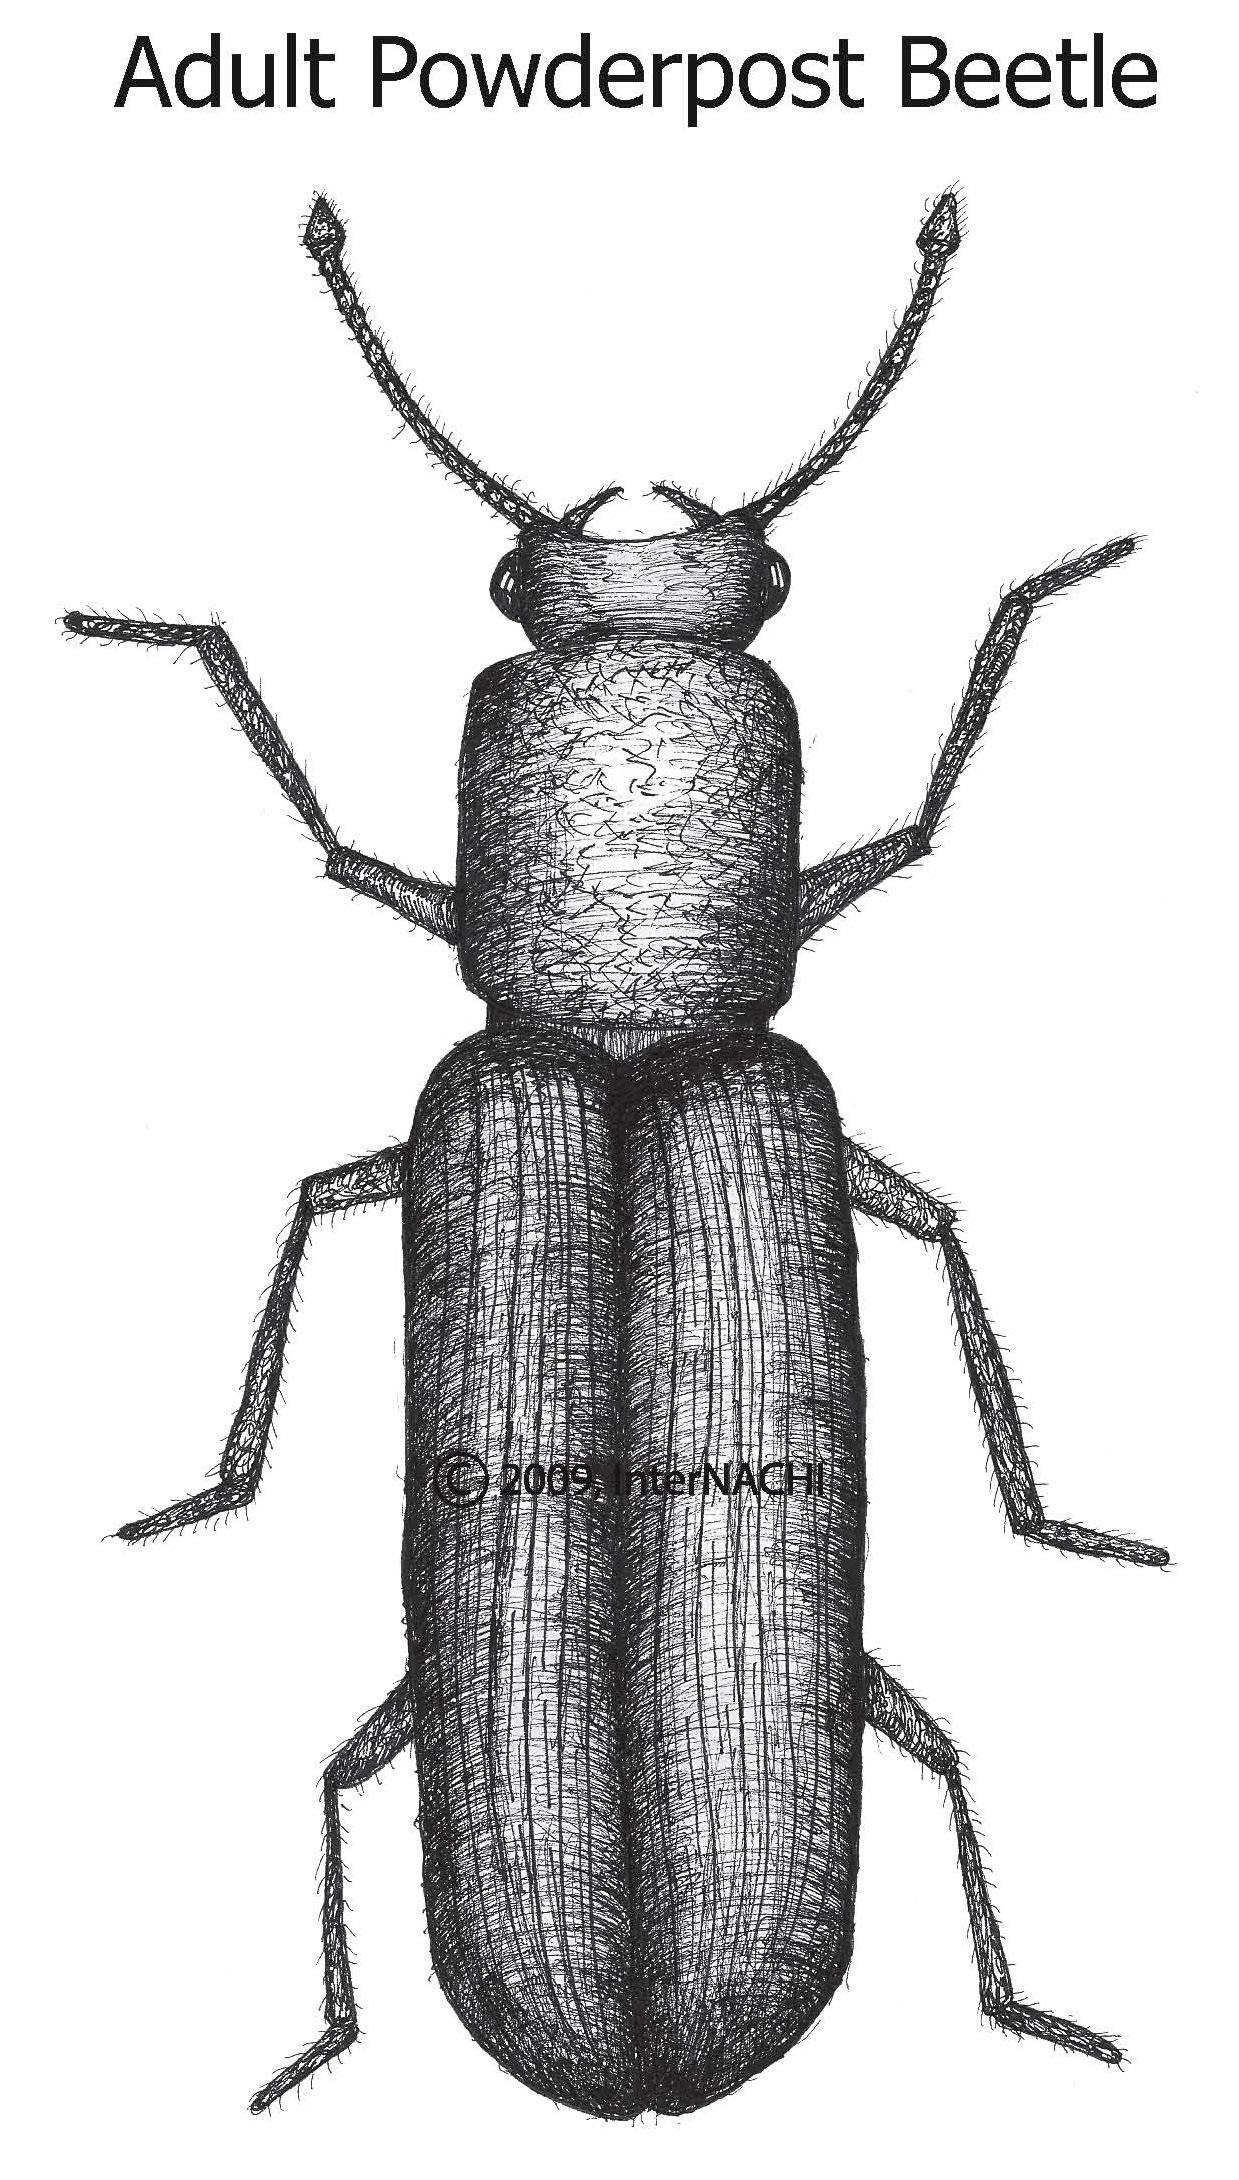 Adult powderpost beetle.